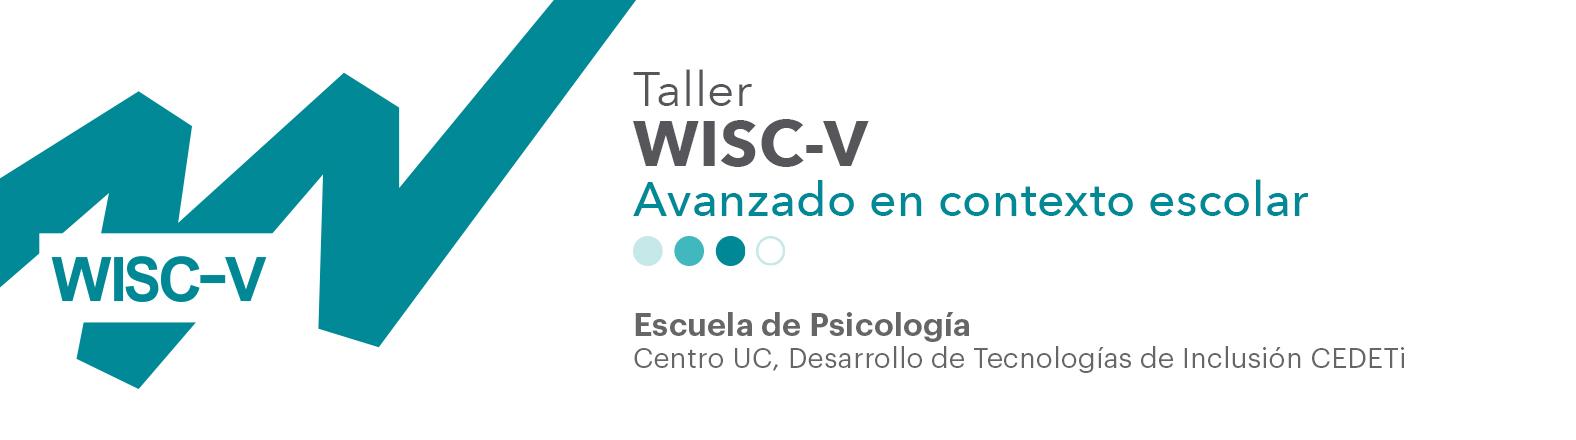 imagen taller WISC-V nivel avanzado en el contexto escolar